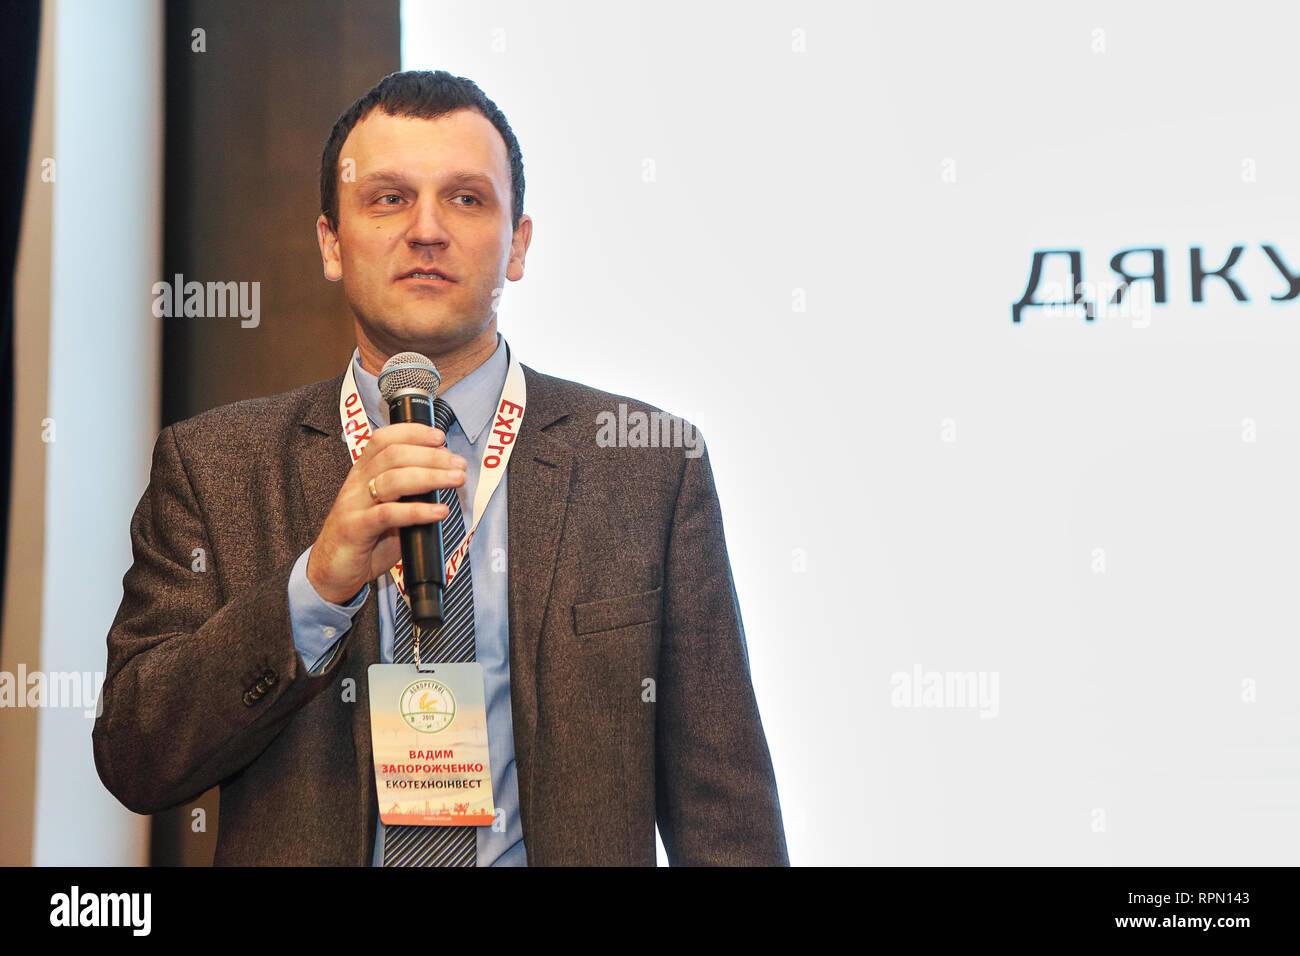 Ukraine's natural gas trader Vadym Zaporoshchenko from ETI trading speaks at Agropetrol 2019 energy conference in Kiev Premier palace hotel, 8Feb 2019 - Stock Image